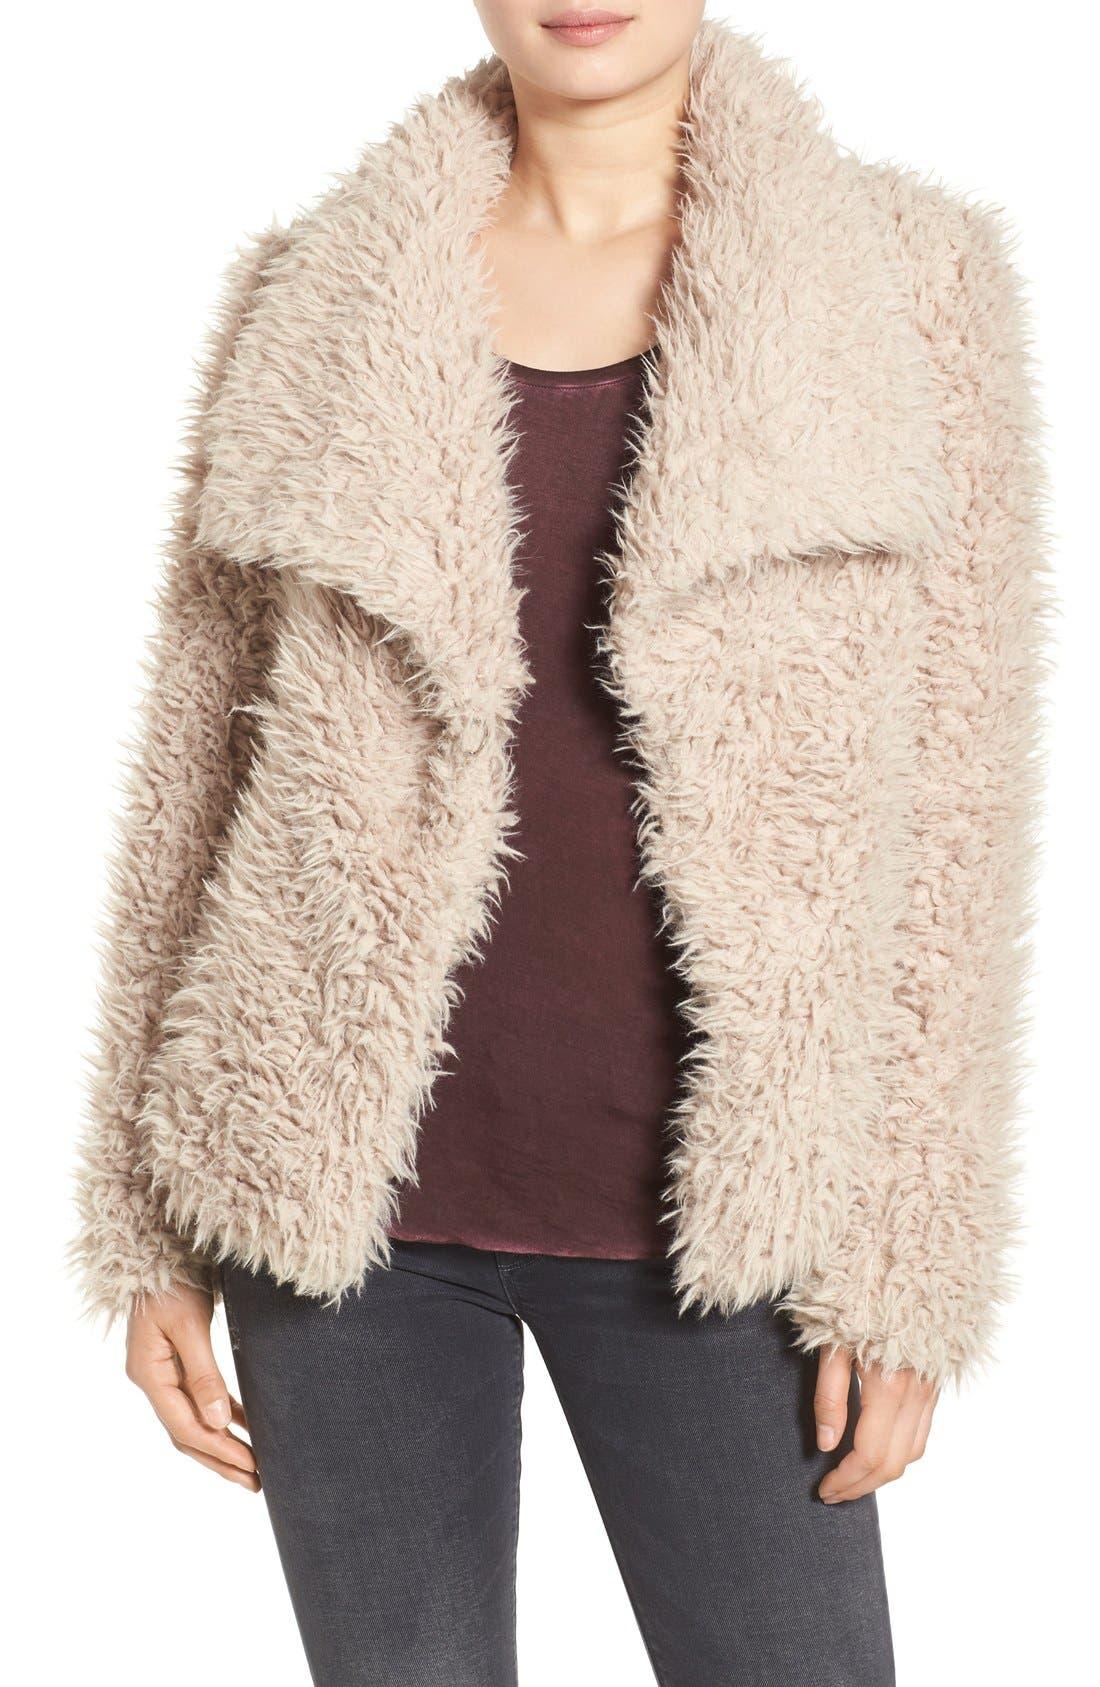 Alternate Image 1 Selected - Betsey Johnson Faux Fur Jacket